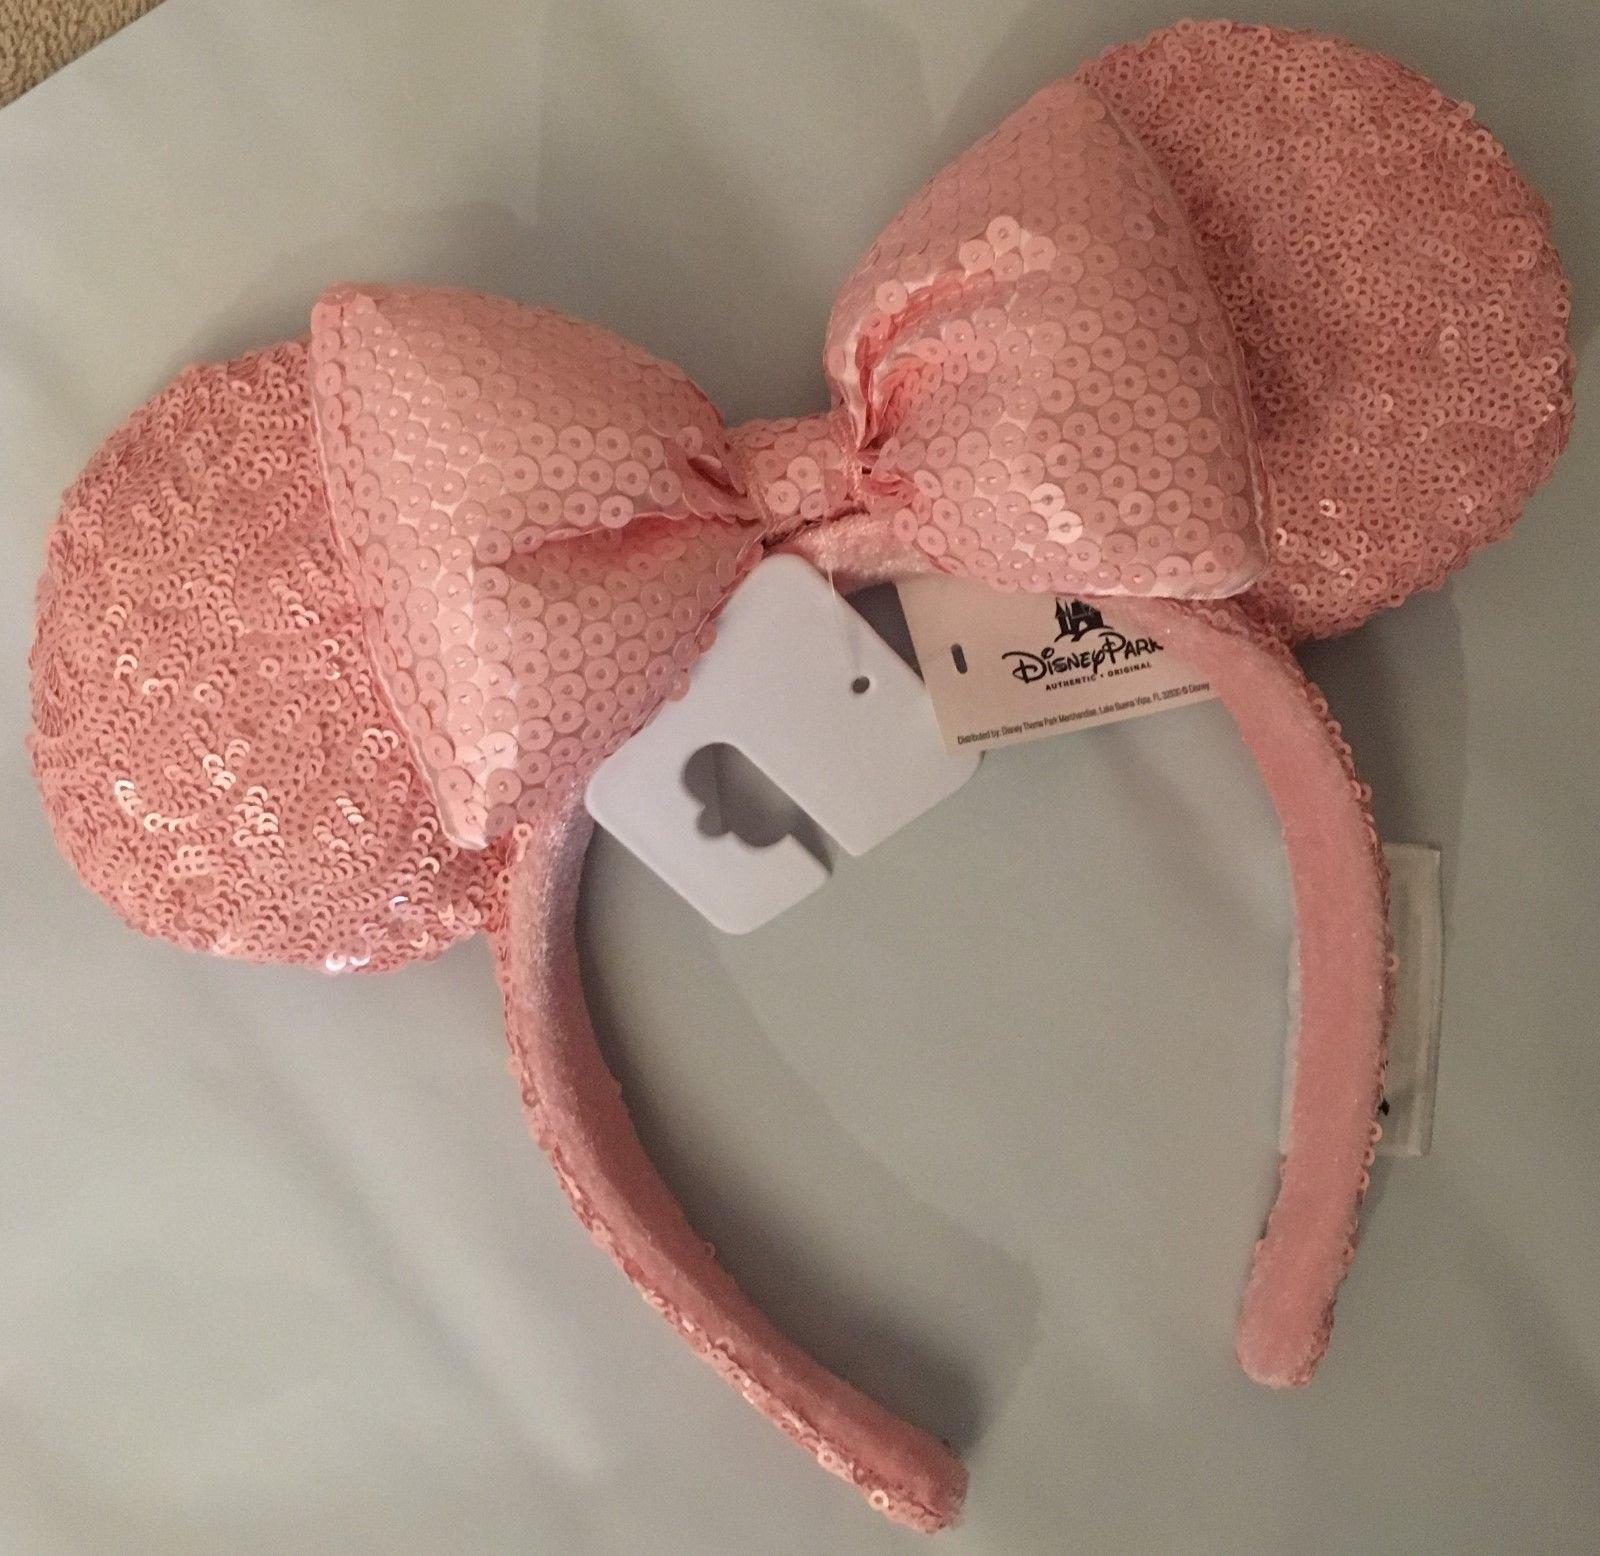 Disney Parks Millennial Pink Minnie Mouse Ears Bow Headband